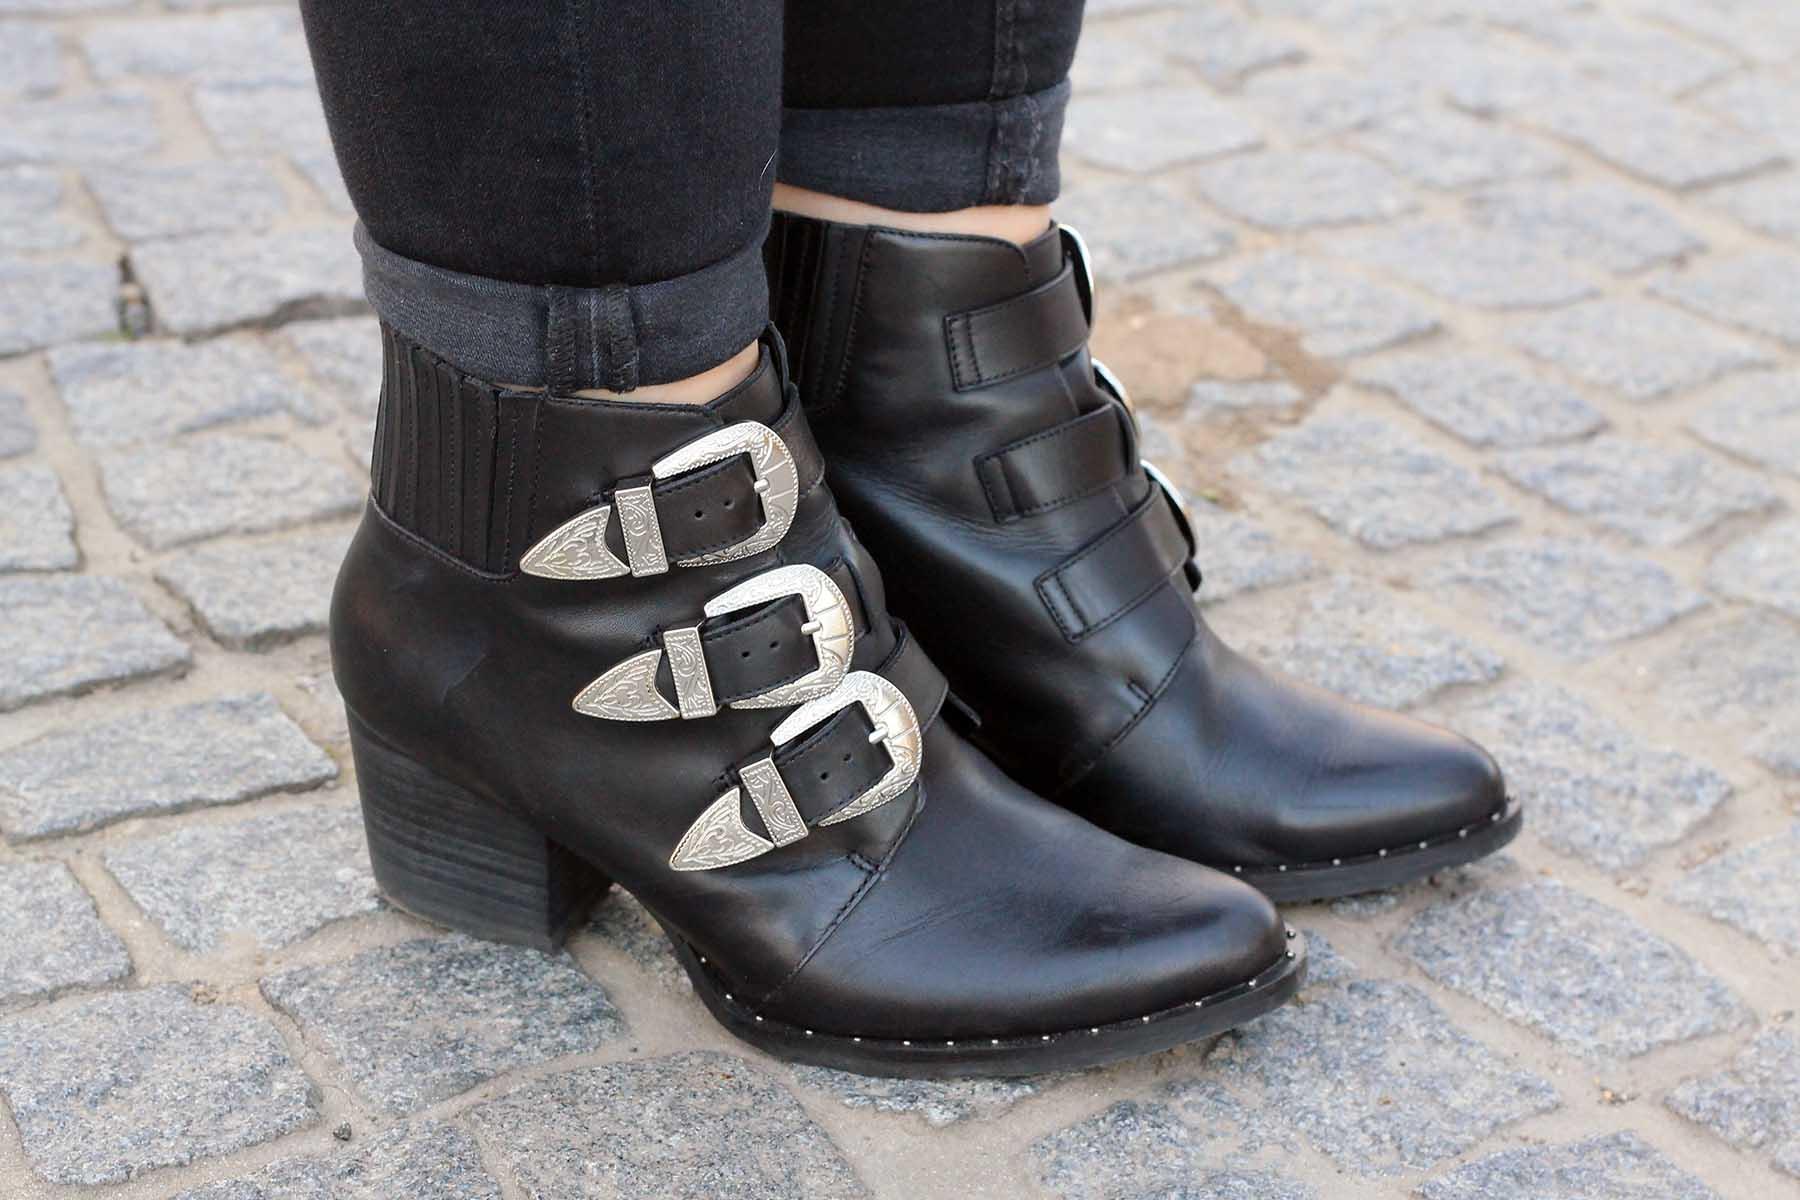 stiefeletten-asos-schuhe-boots-modeblog-fashionblog